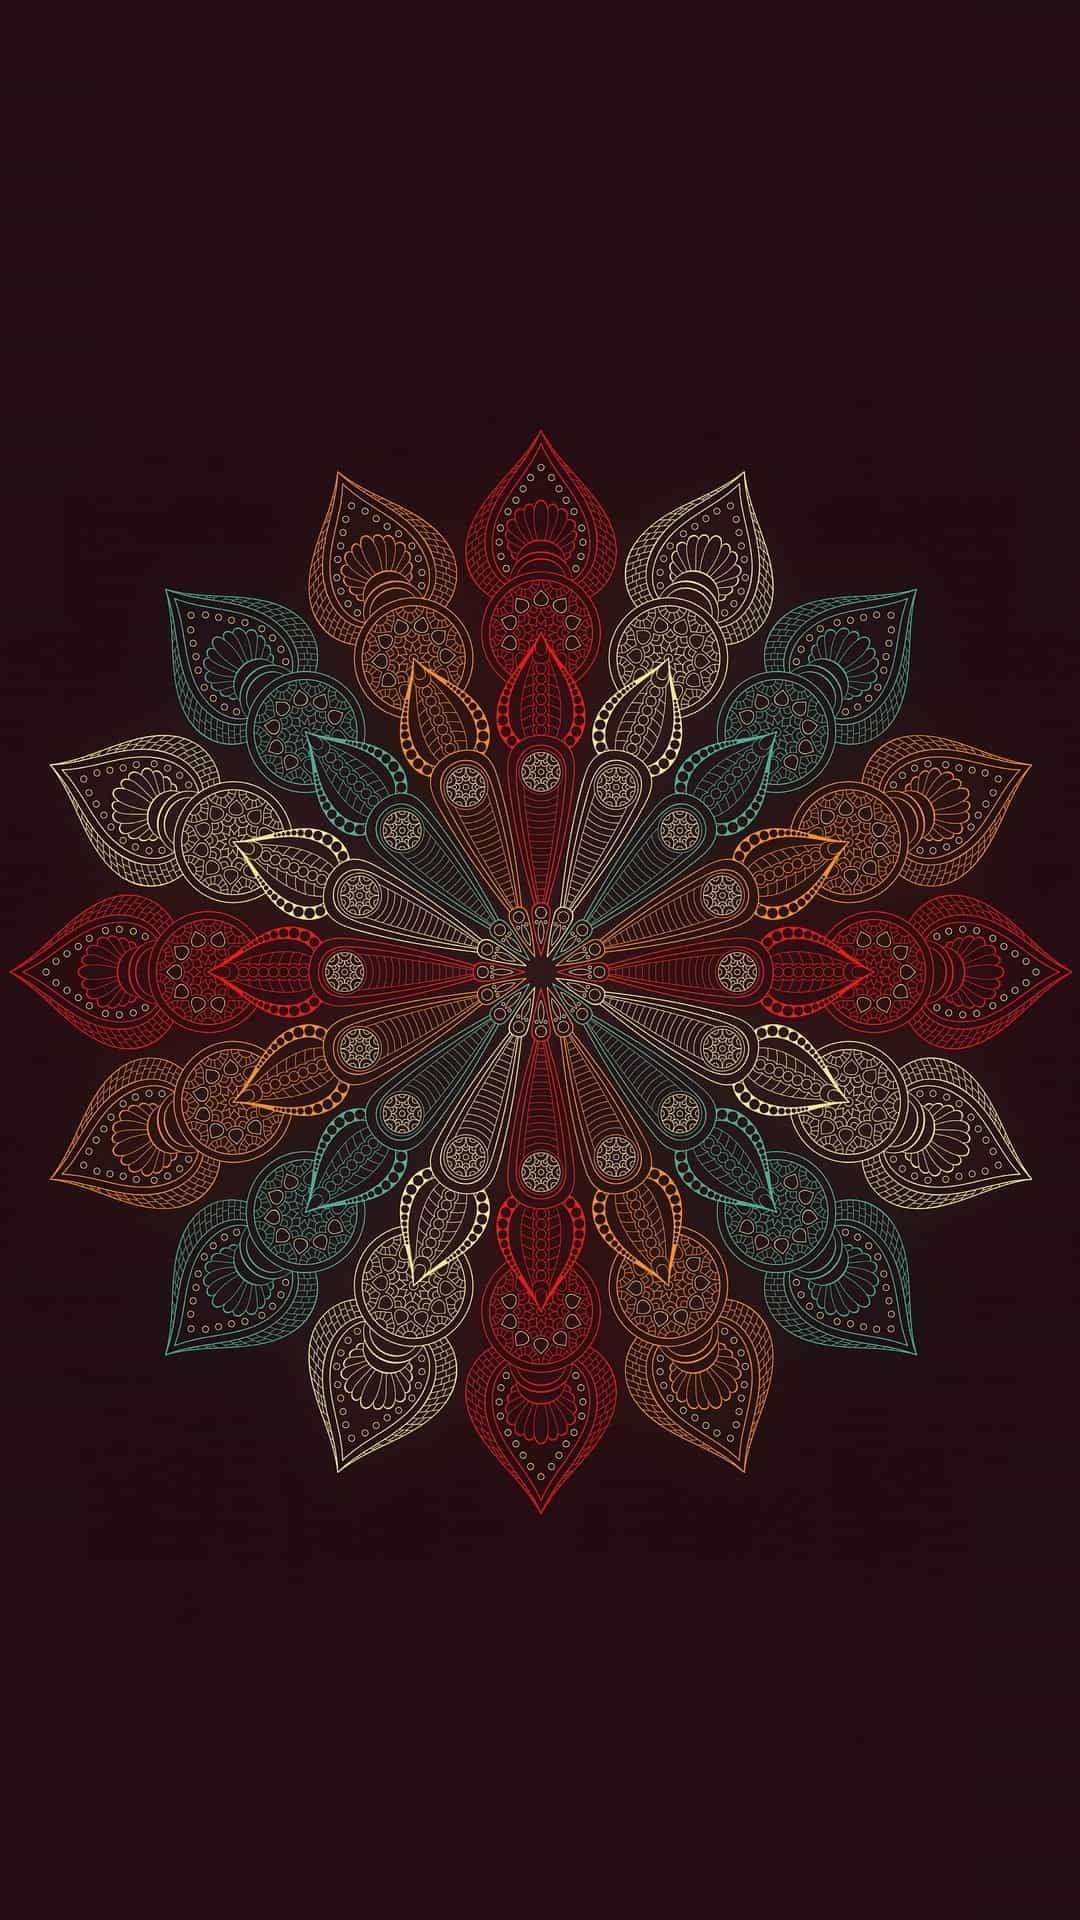 خلفيات ايفون Art Wallpaper Iphone Graphic Wallpaper Mandala Wallpaper